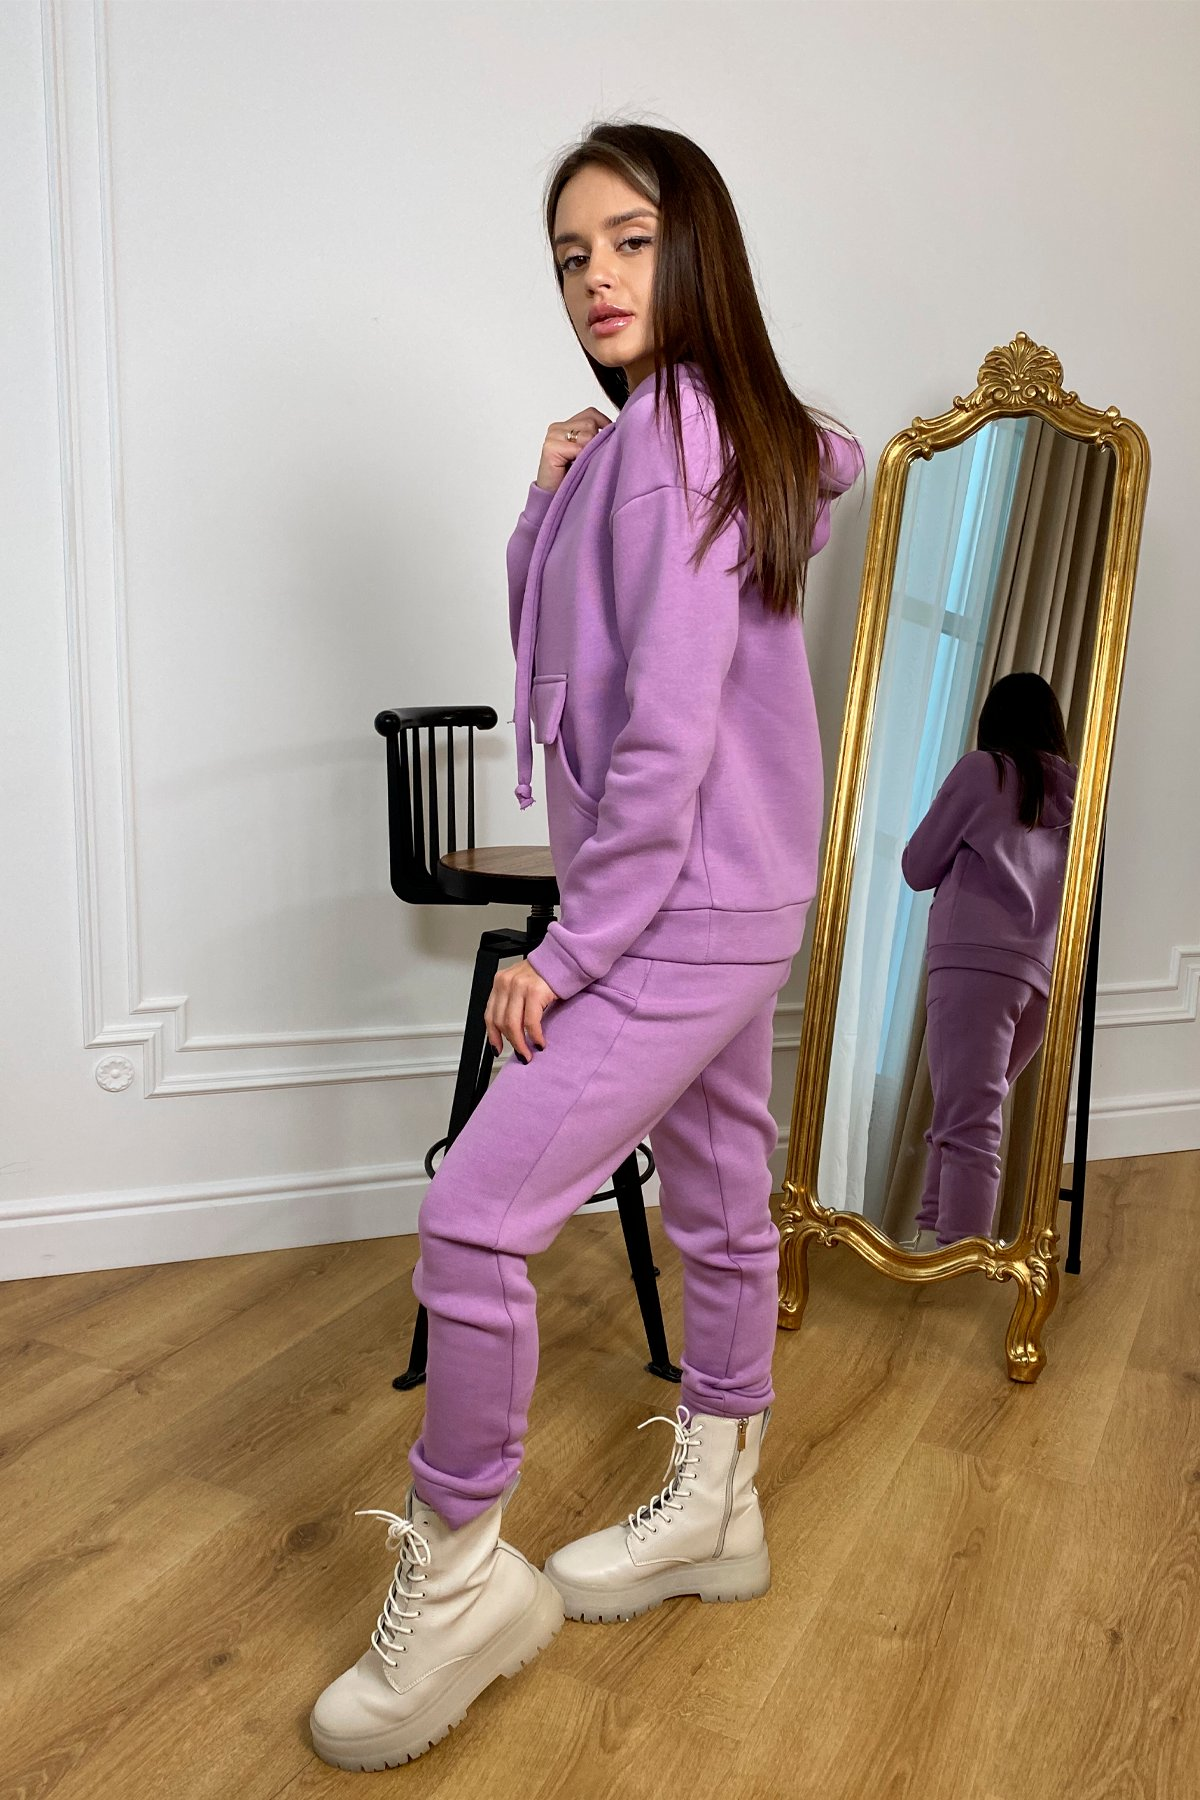 Бруклин  прогулочный костюм 3х нитка с начесом  9663 АРТ. 46382 Цвет: Лаванда/1 - фото 5, интернет магазин tm-modus.ru